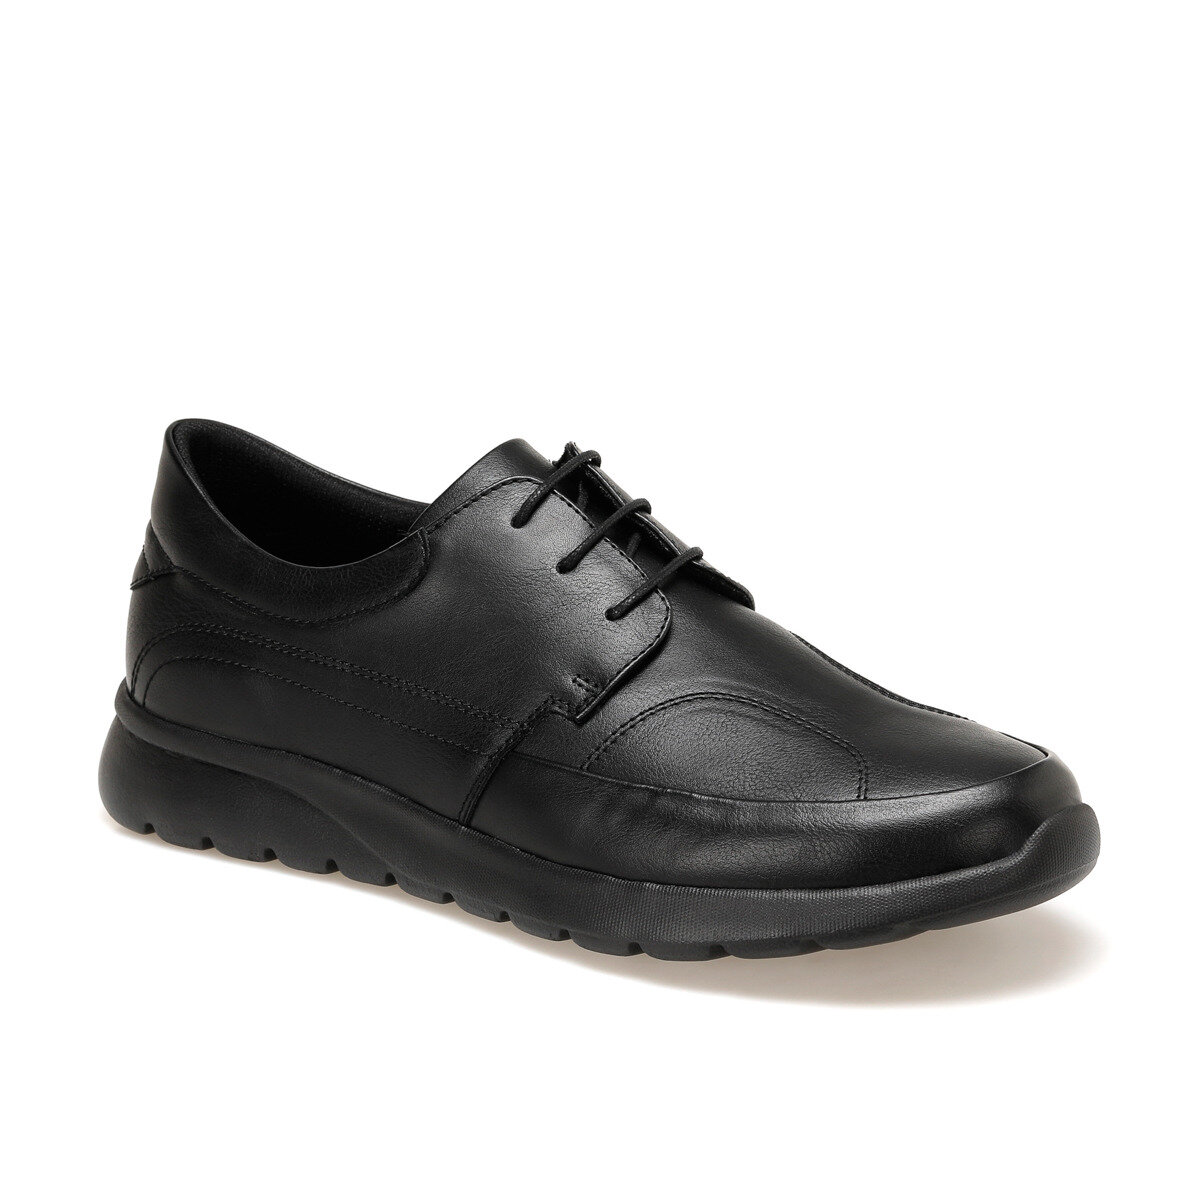 FLO FRL-2 Black Men 'S Classic Shoes Flexall